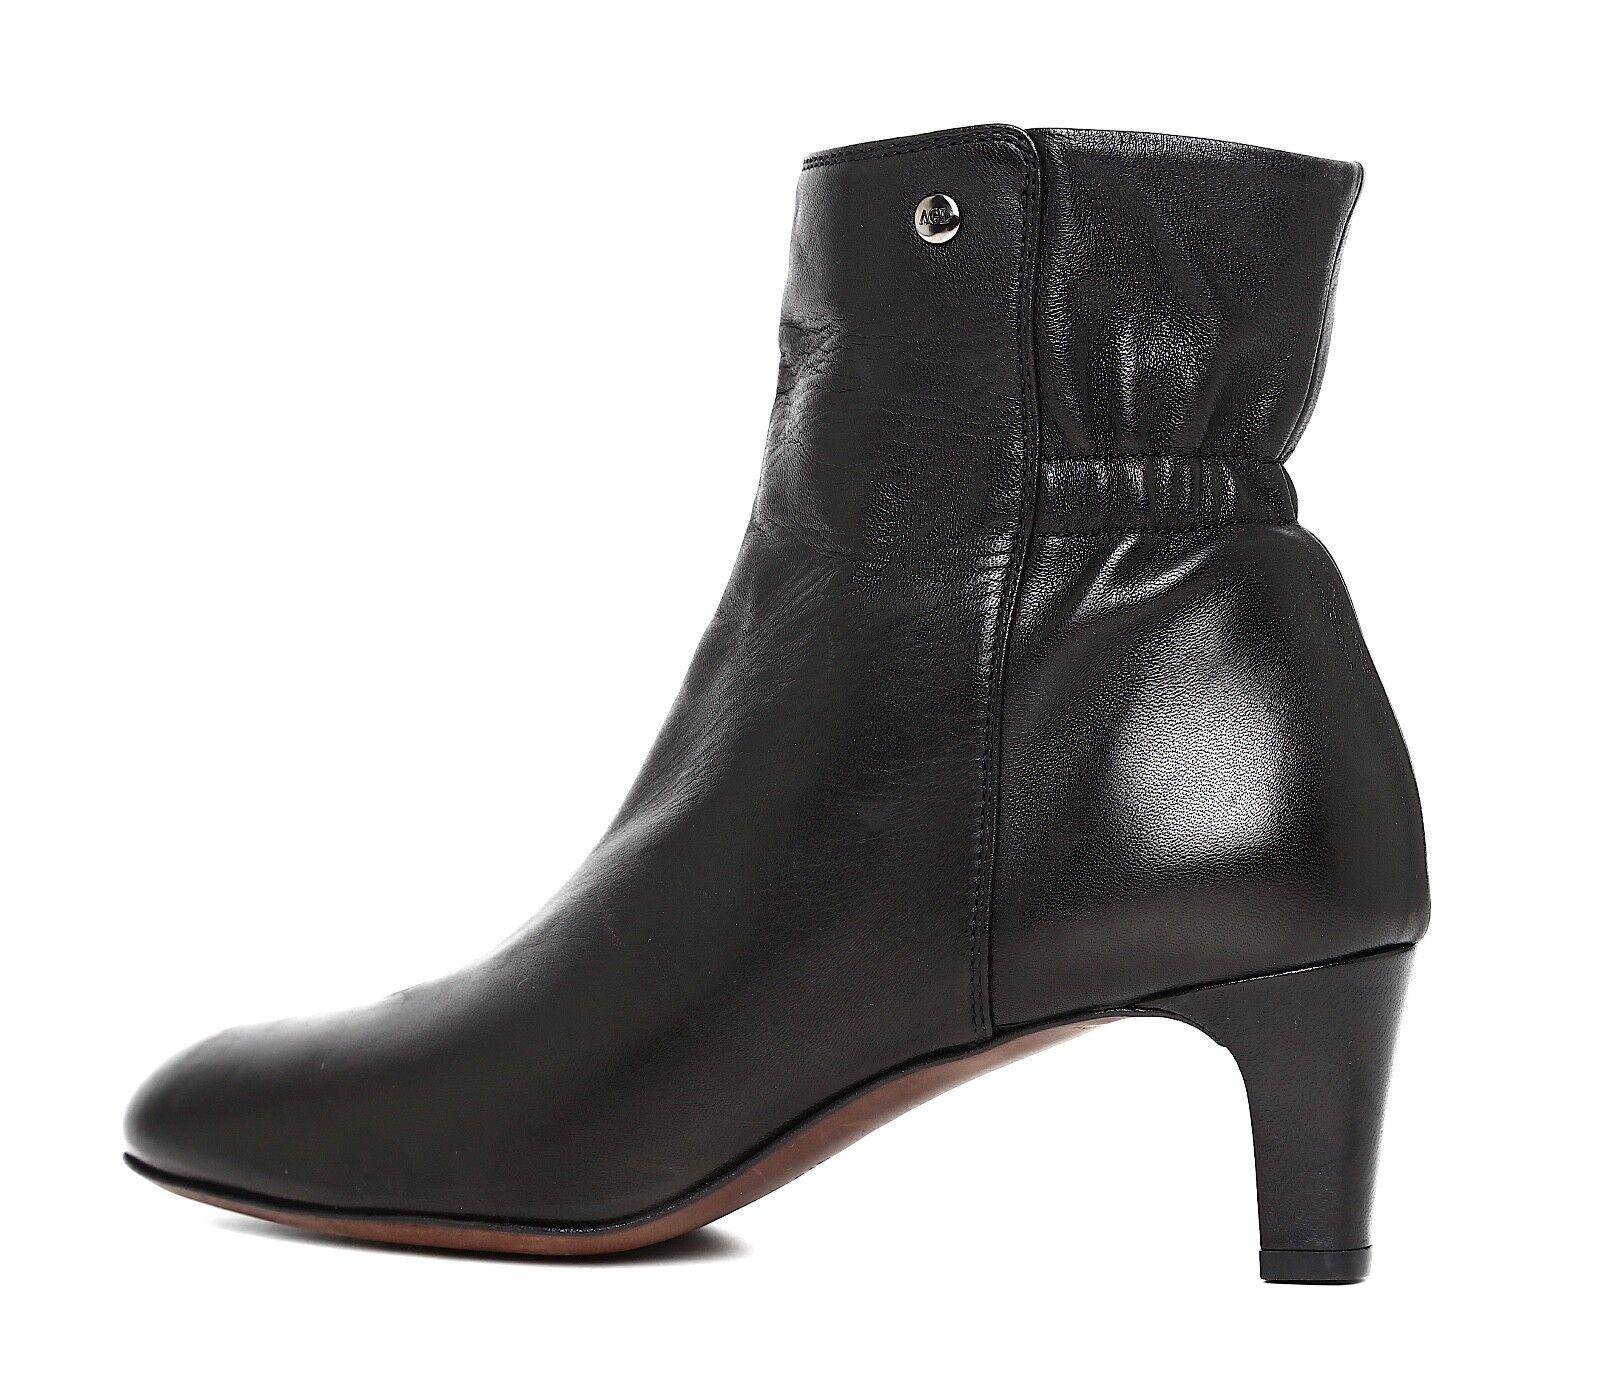 Attilio Giusti Leombruni Carla Leather Bootie Black Women Women Women Sz 39 5909  75565c